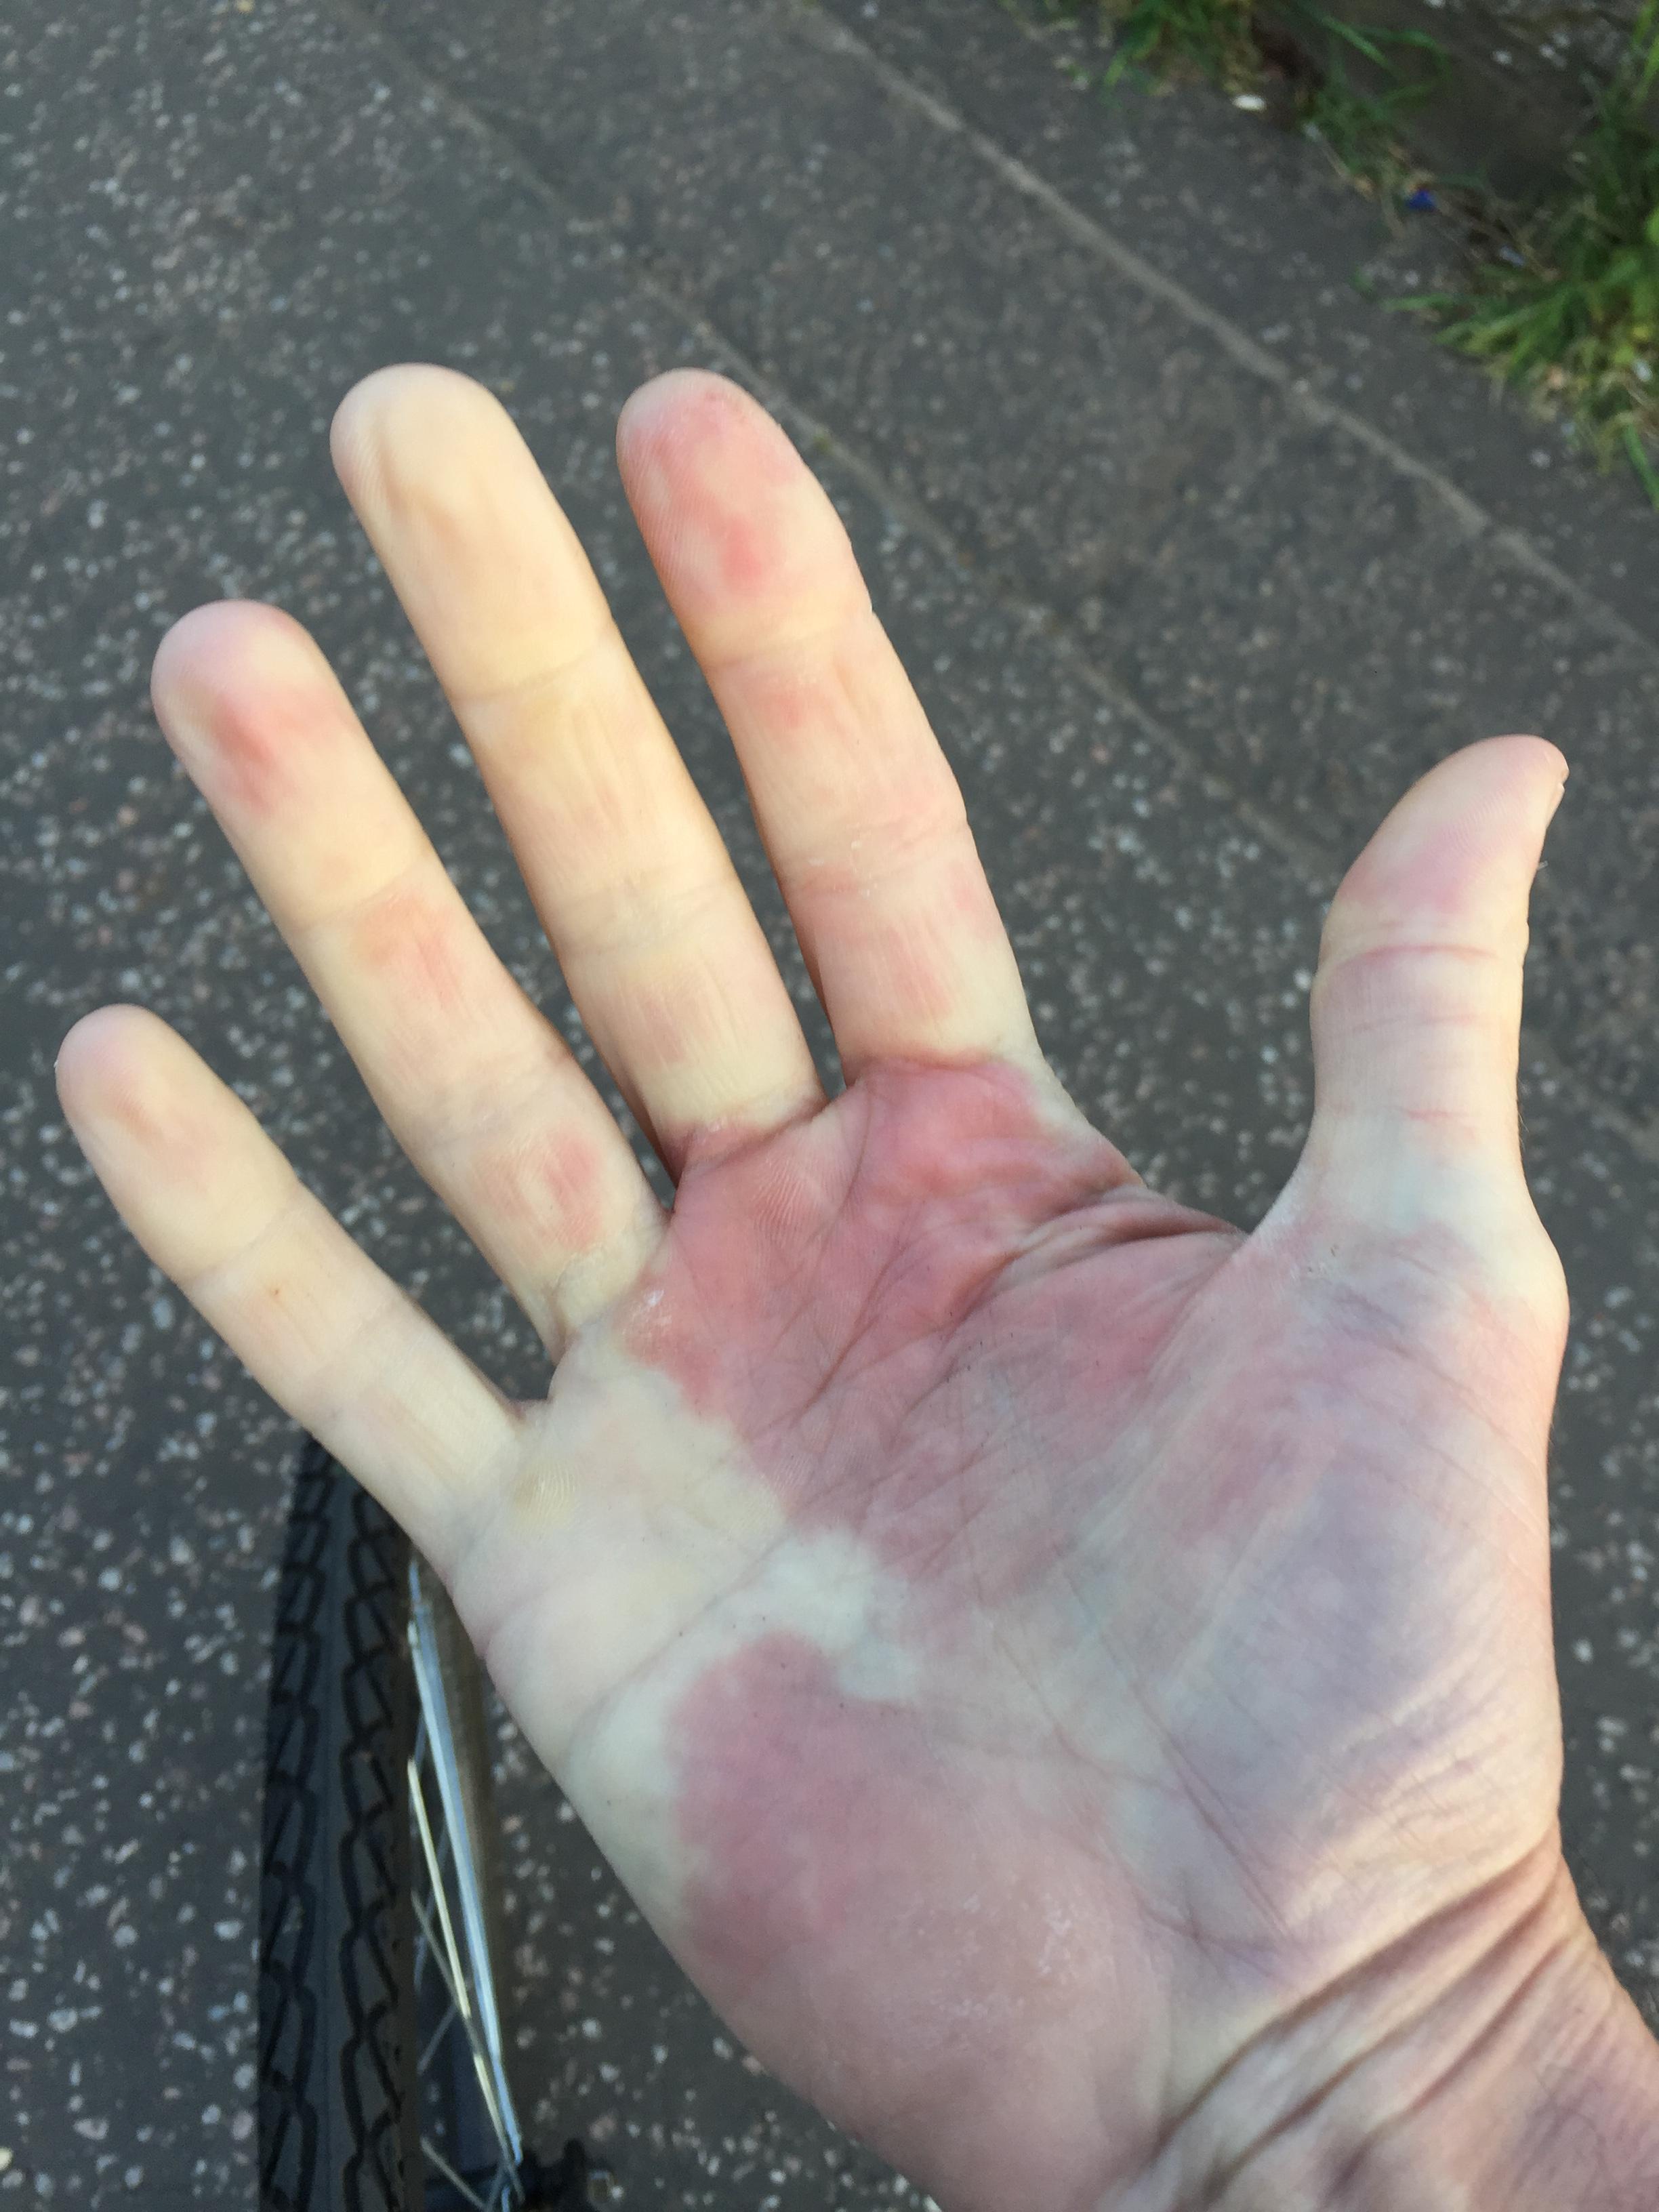 Raynauds fenomen - vita fingrar.jpg